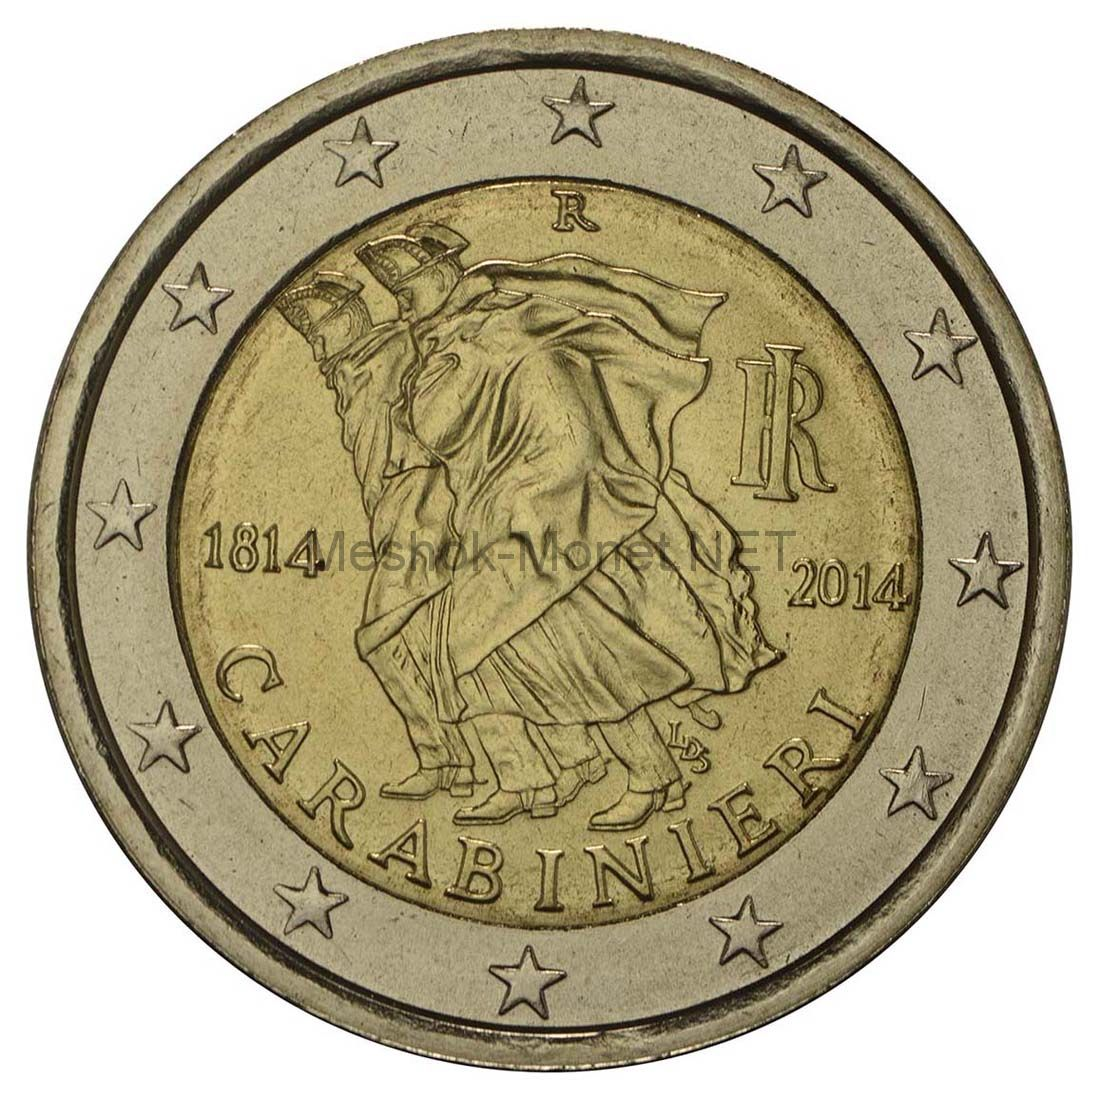 Италия 2 евро 2014, 200 лет карабинерам